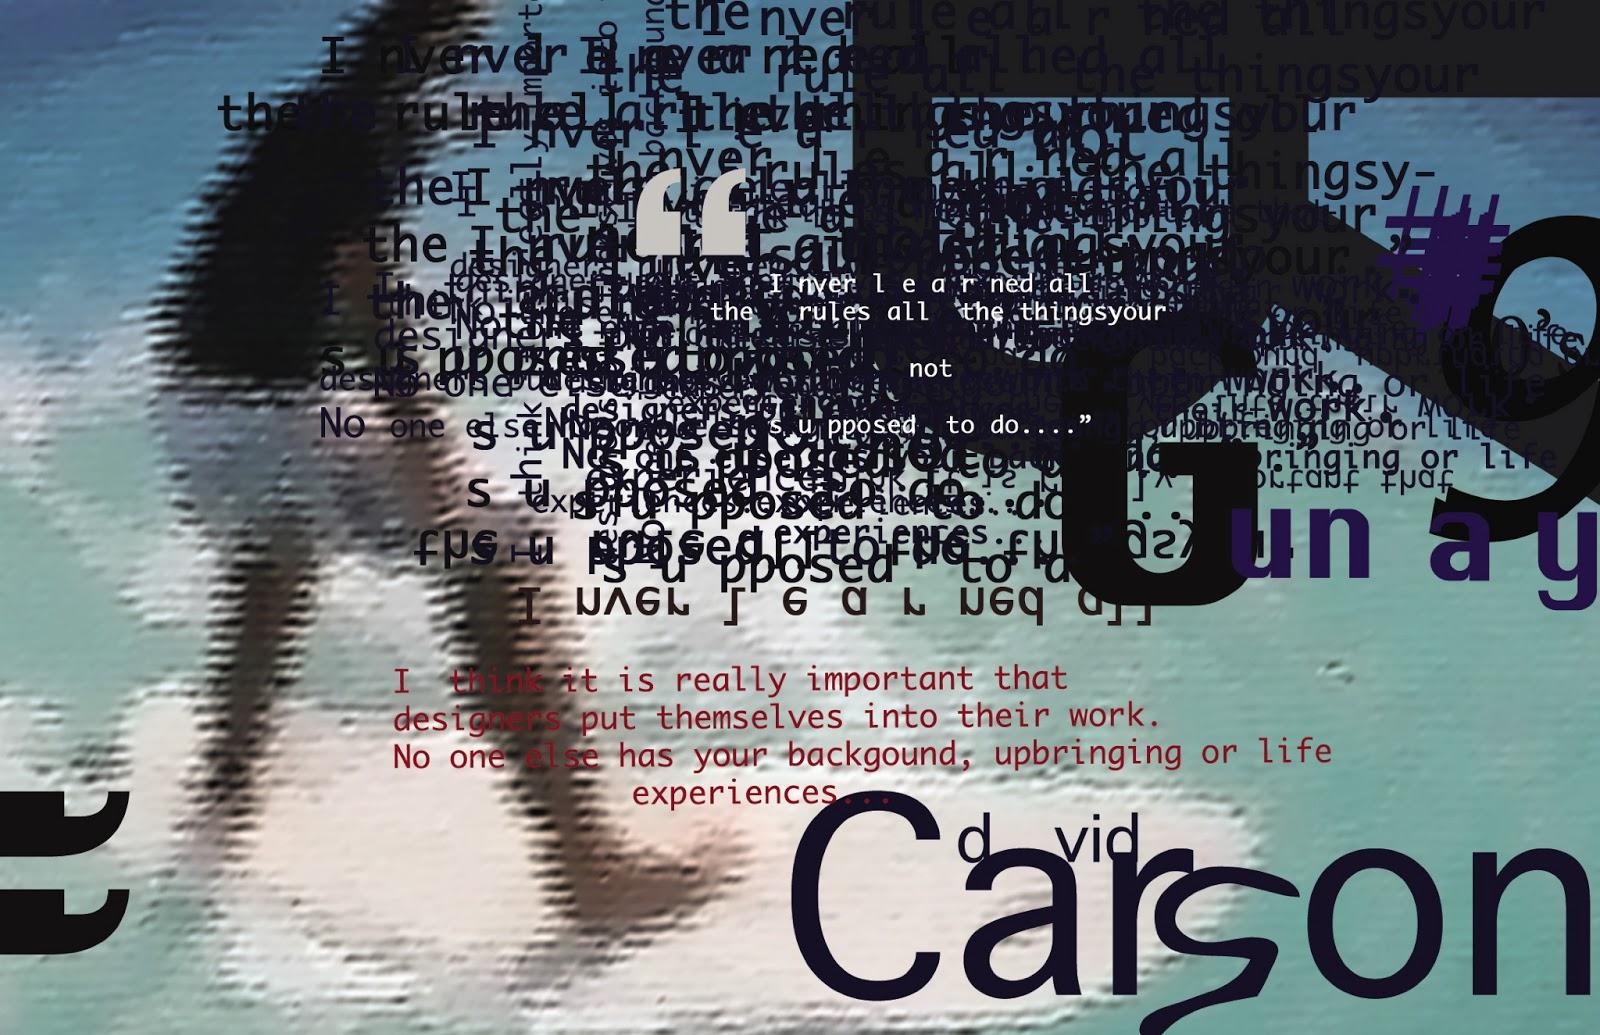 david carson typography - photo #13